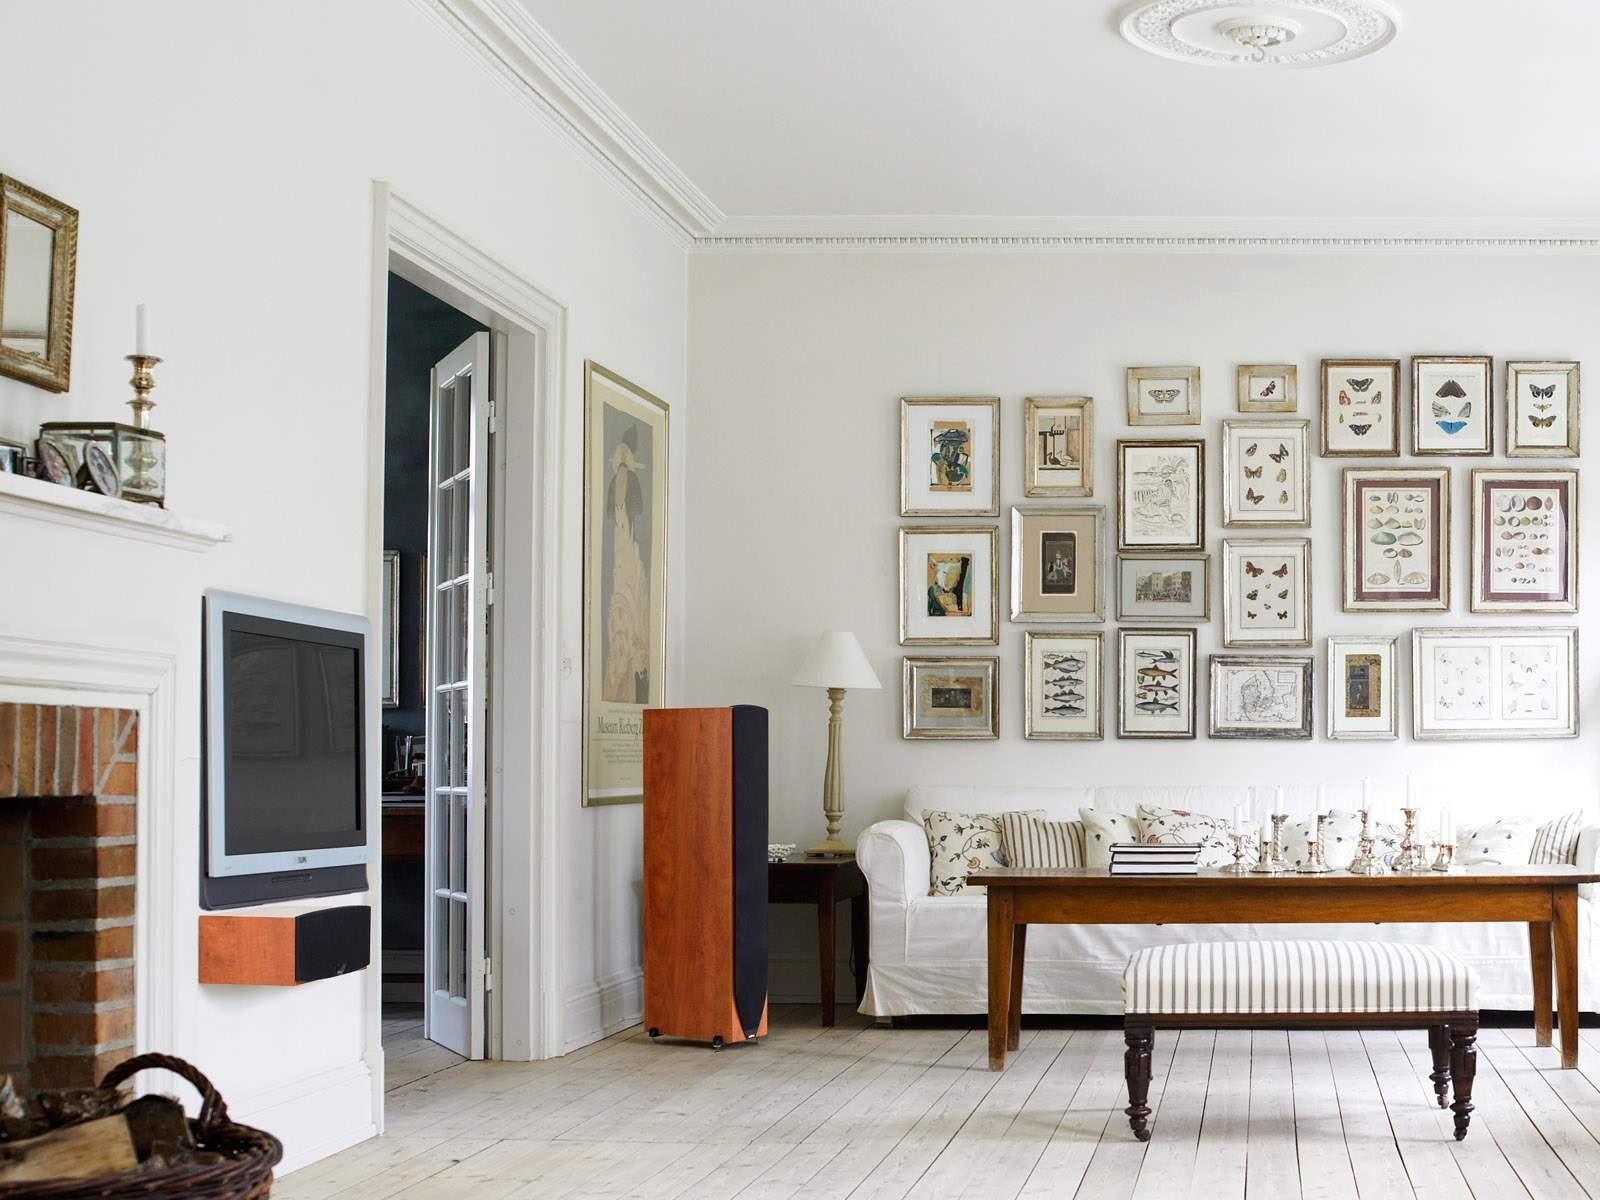 fotos de salas